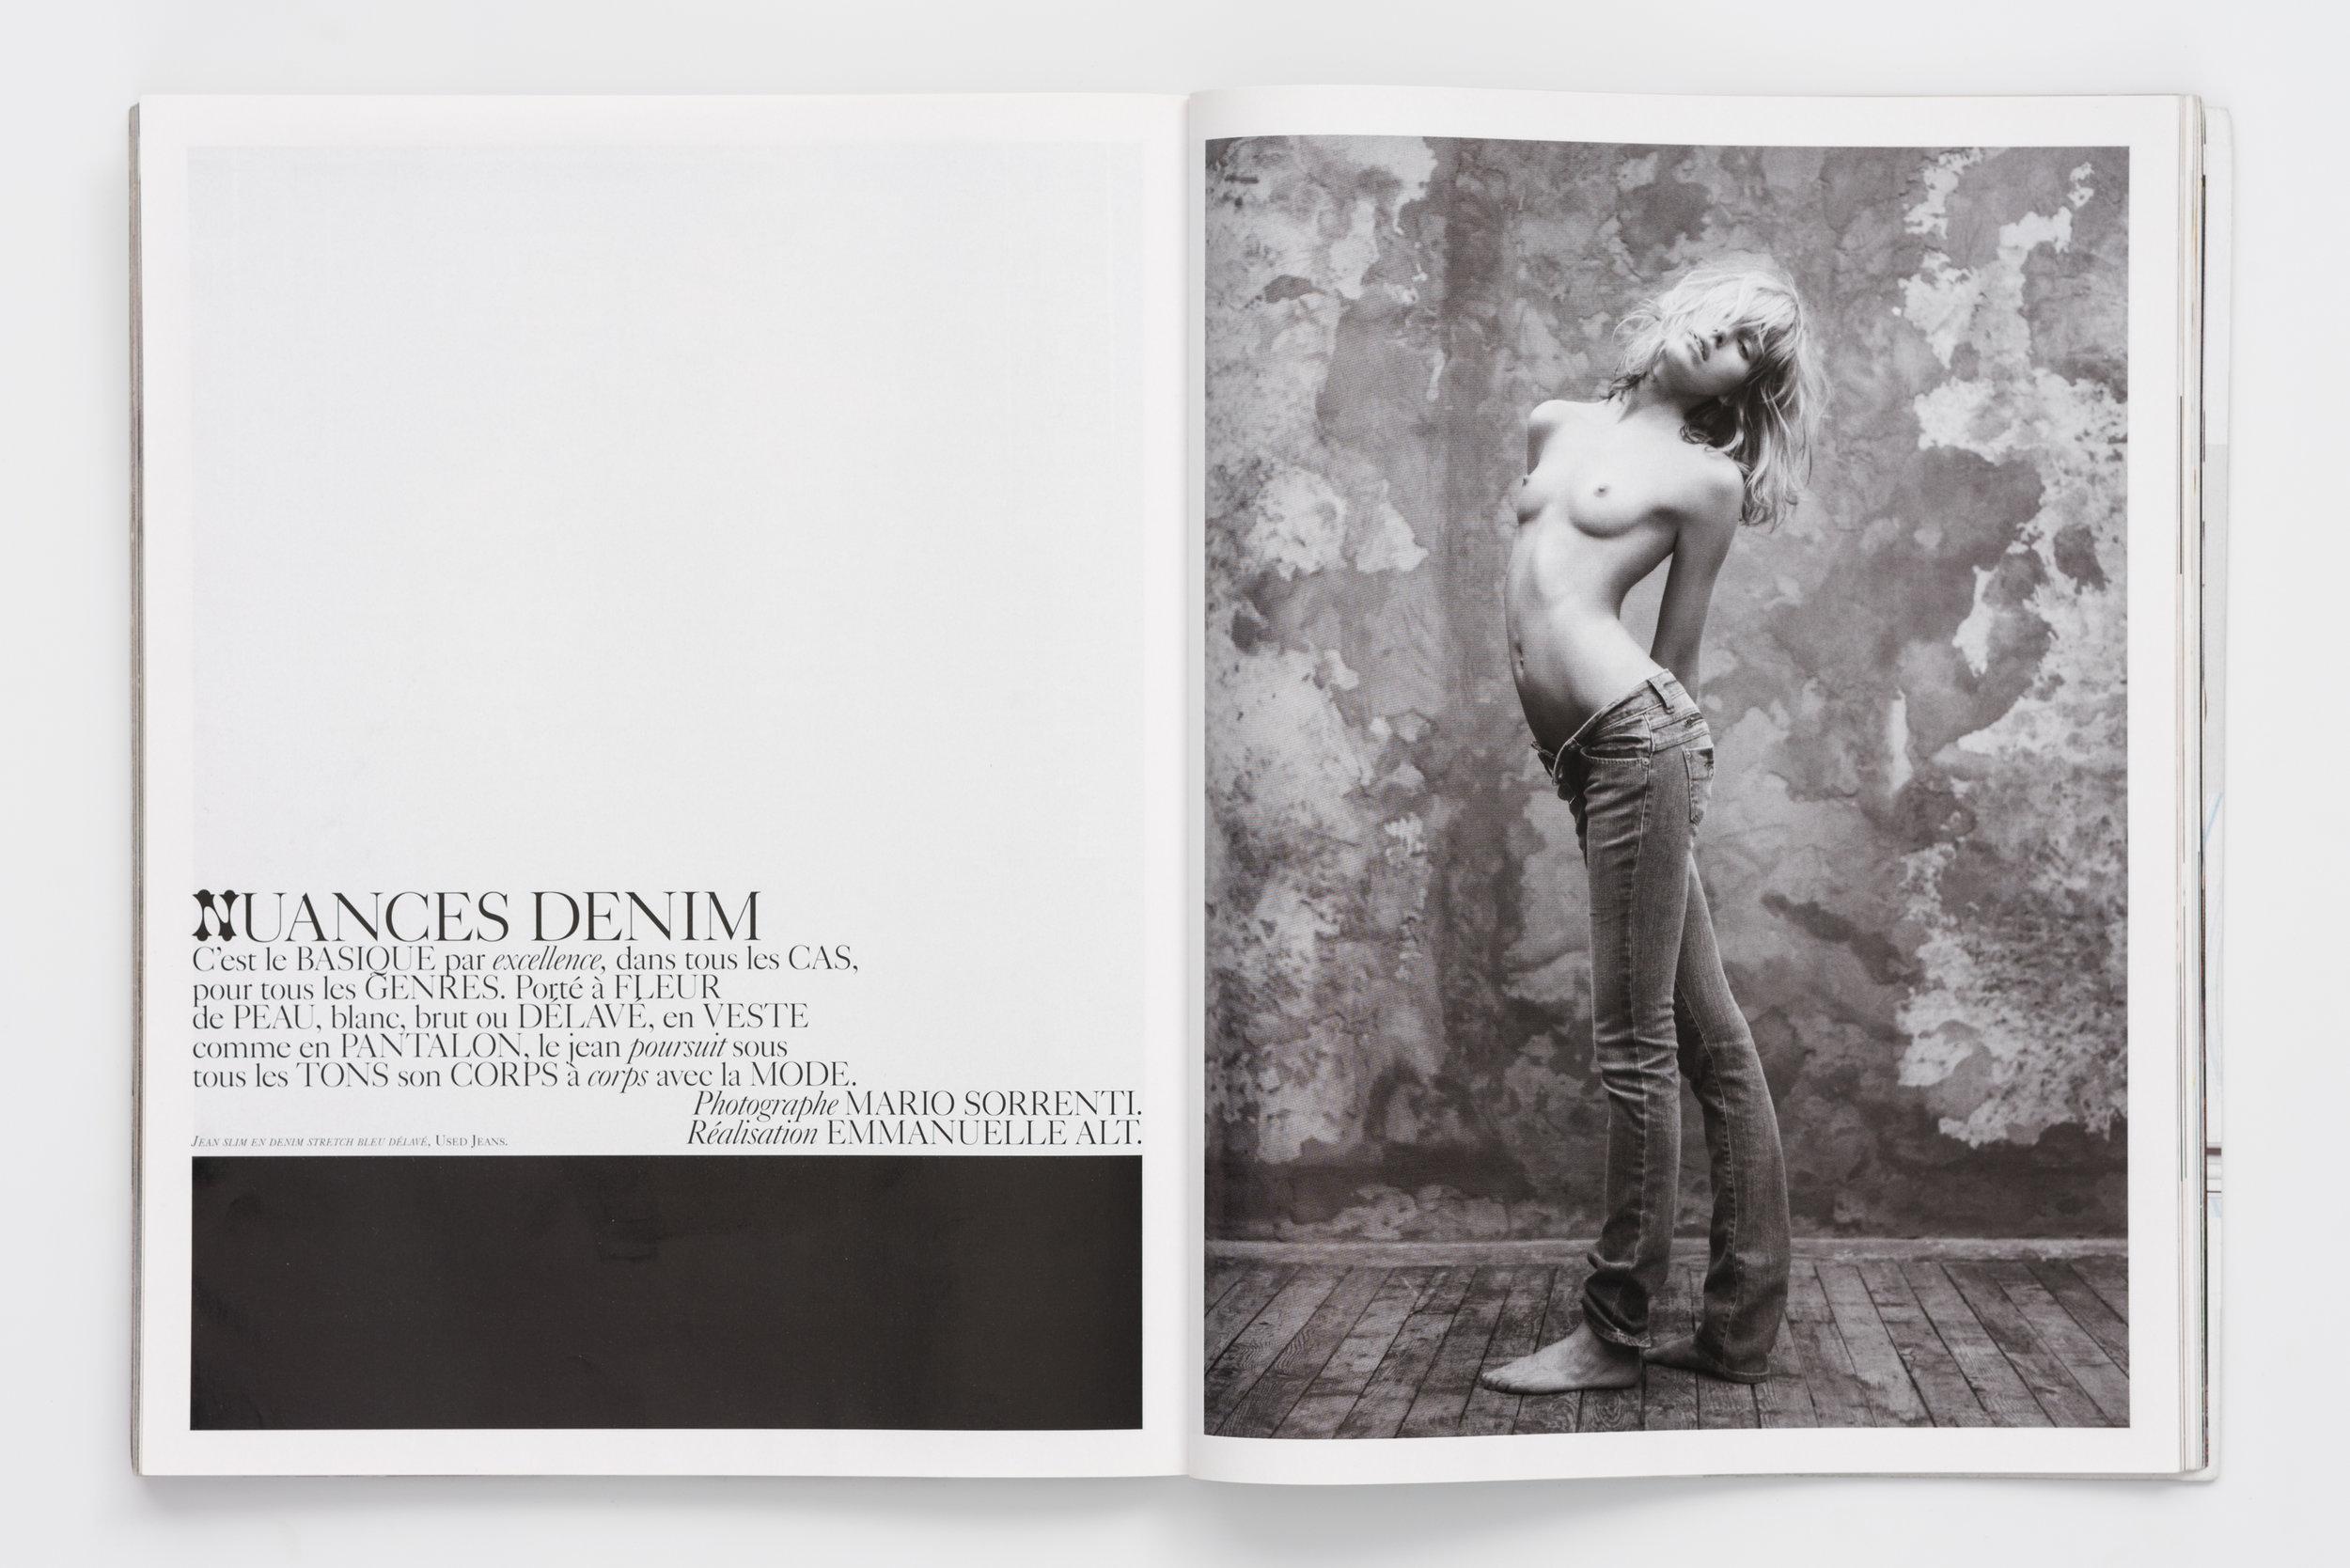 Iselin Steiro_Mario Sorrenti_Vogue Paris_Nuances Denim_1.jpg